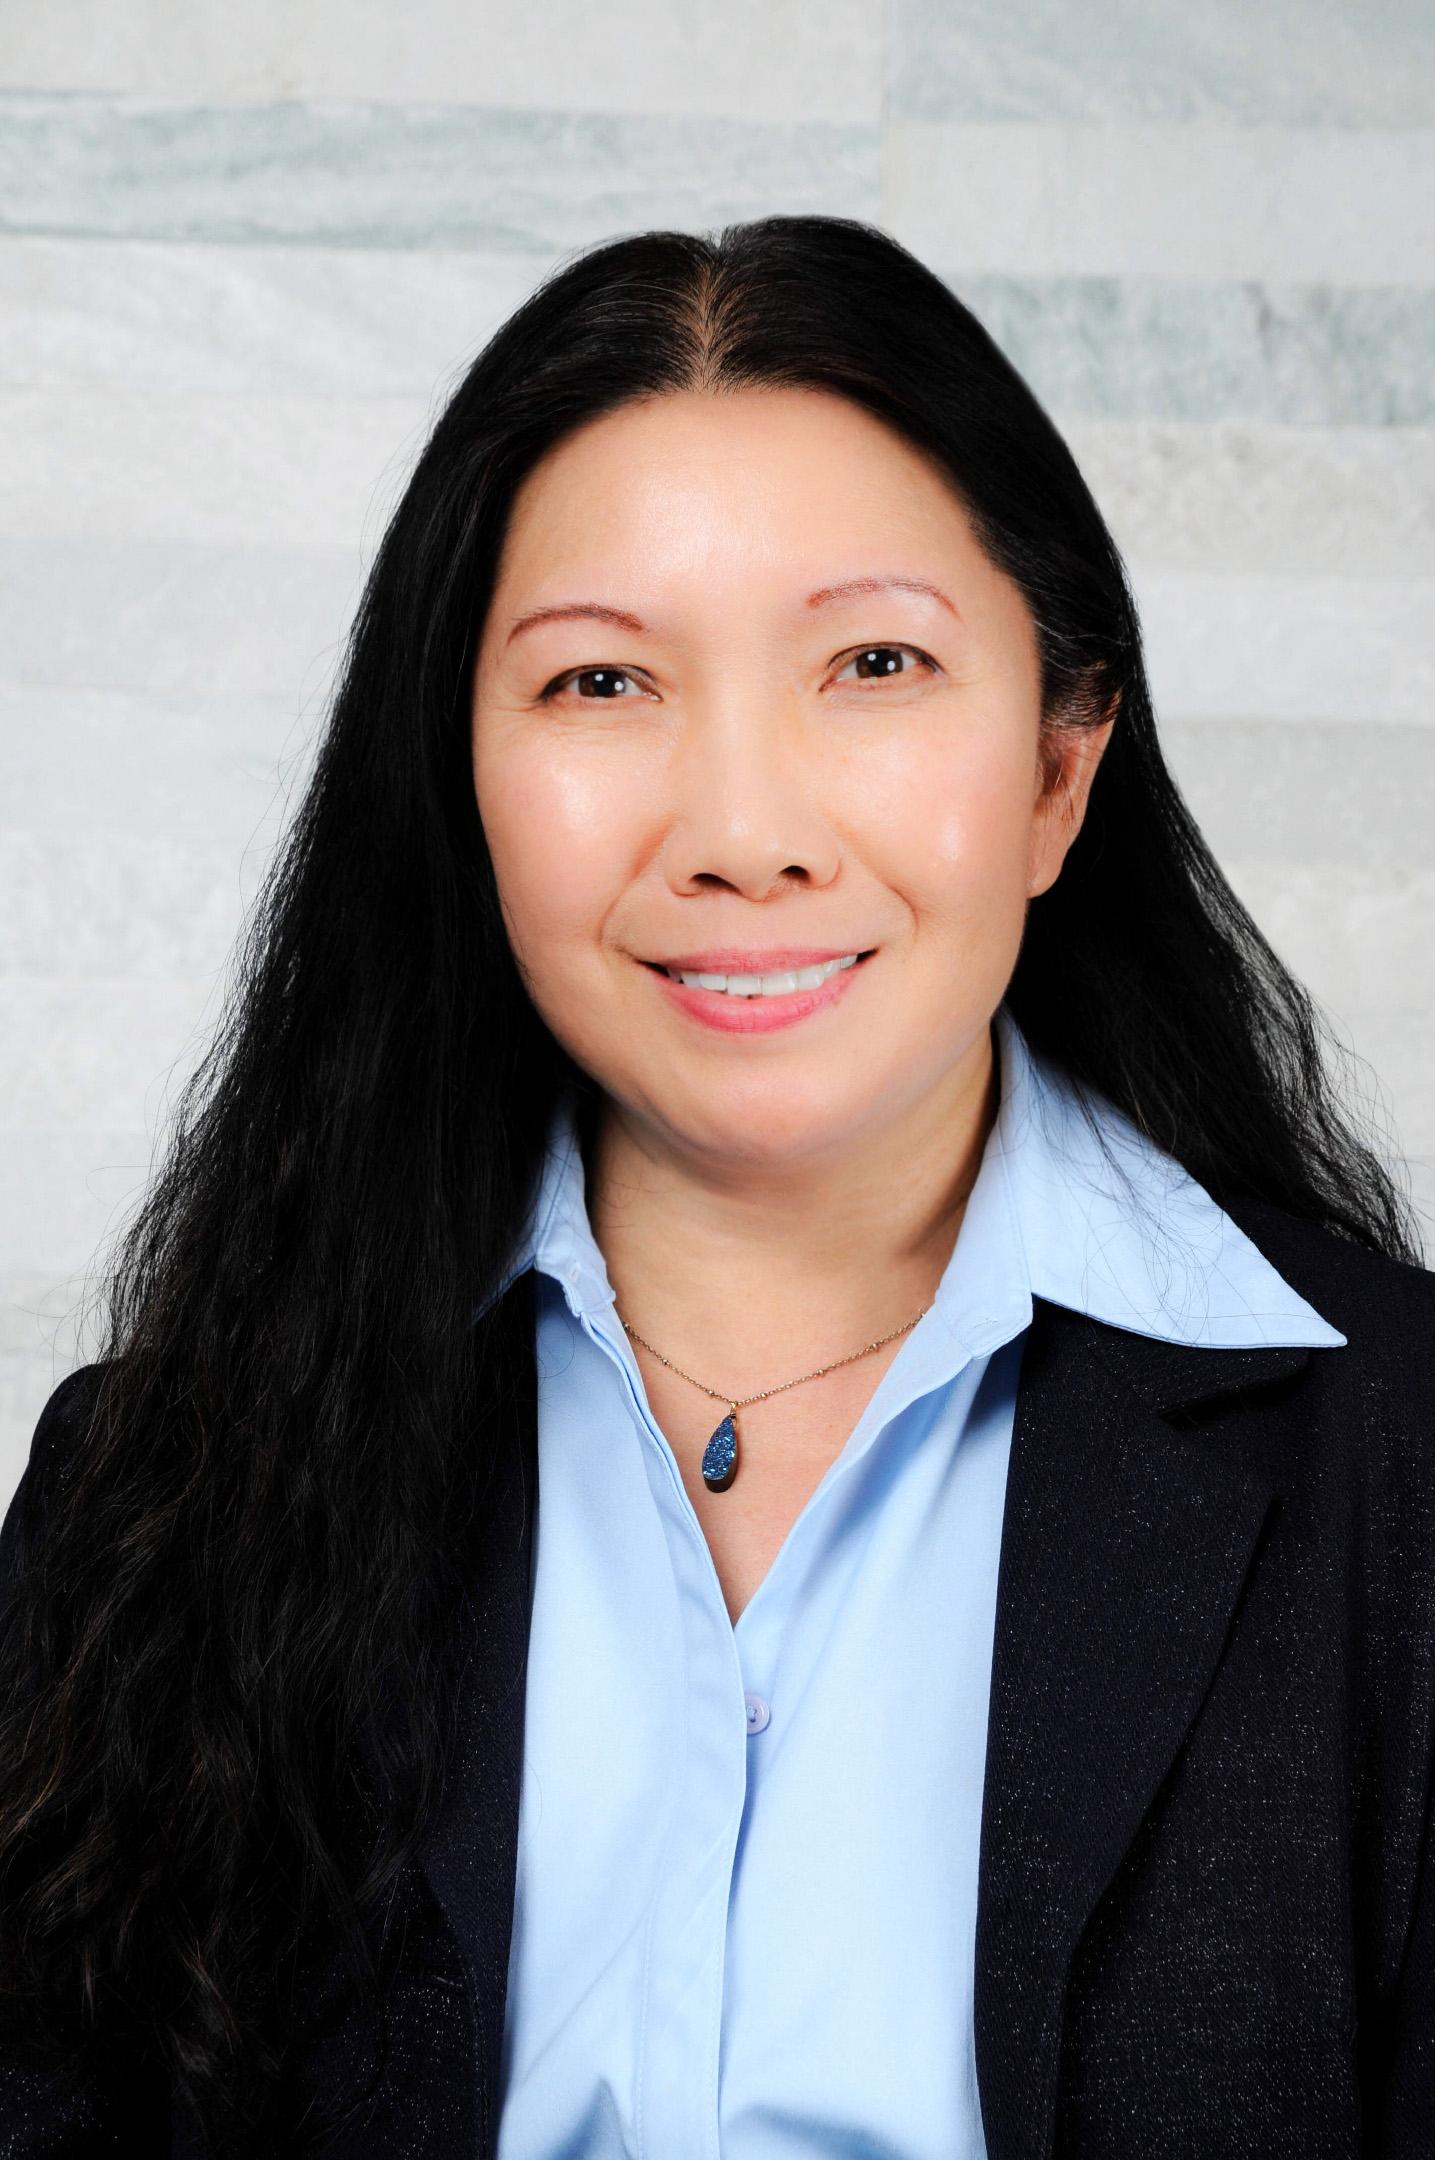 Senior Director Of Marketing & Communications - Cindy Lai